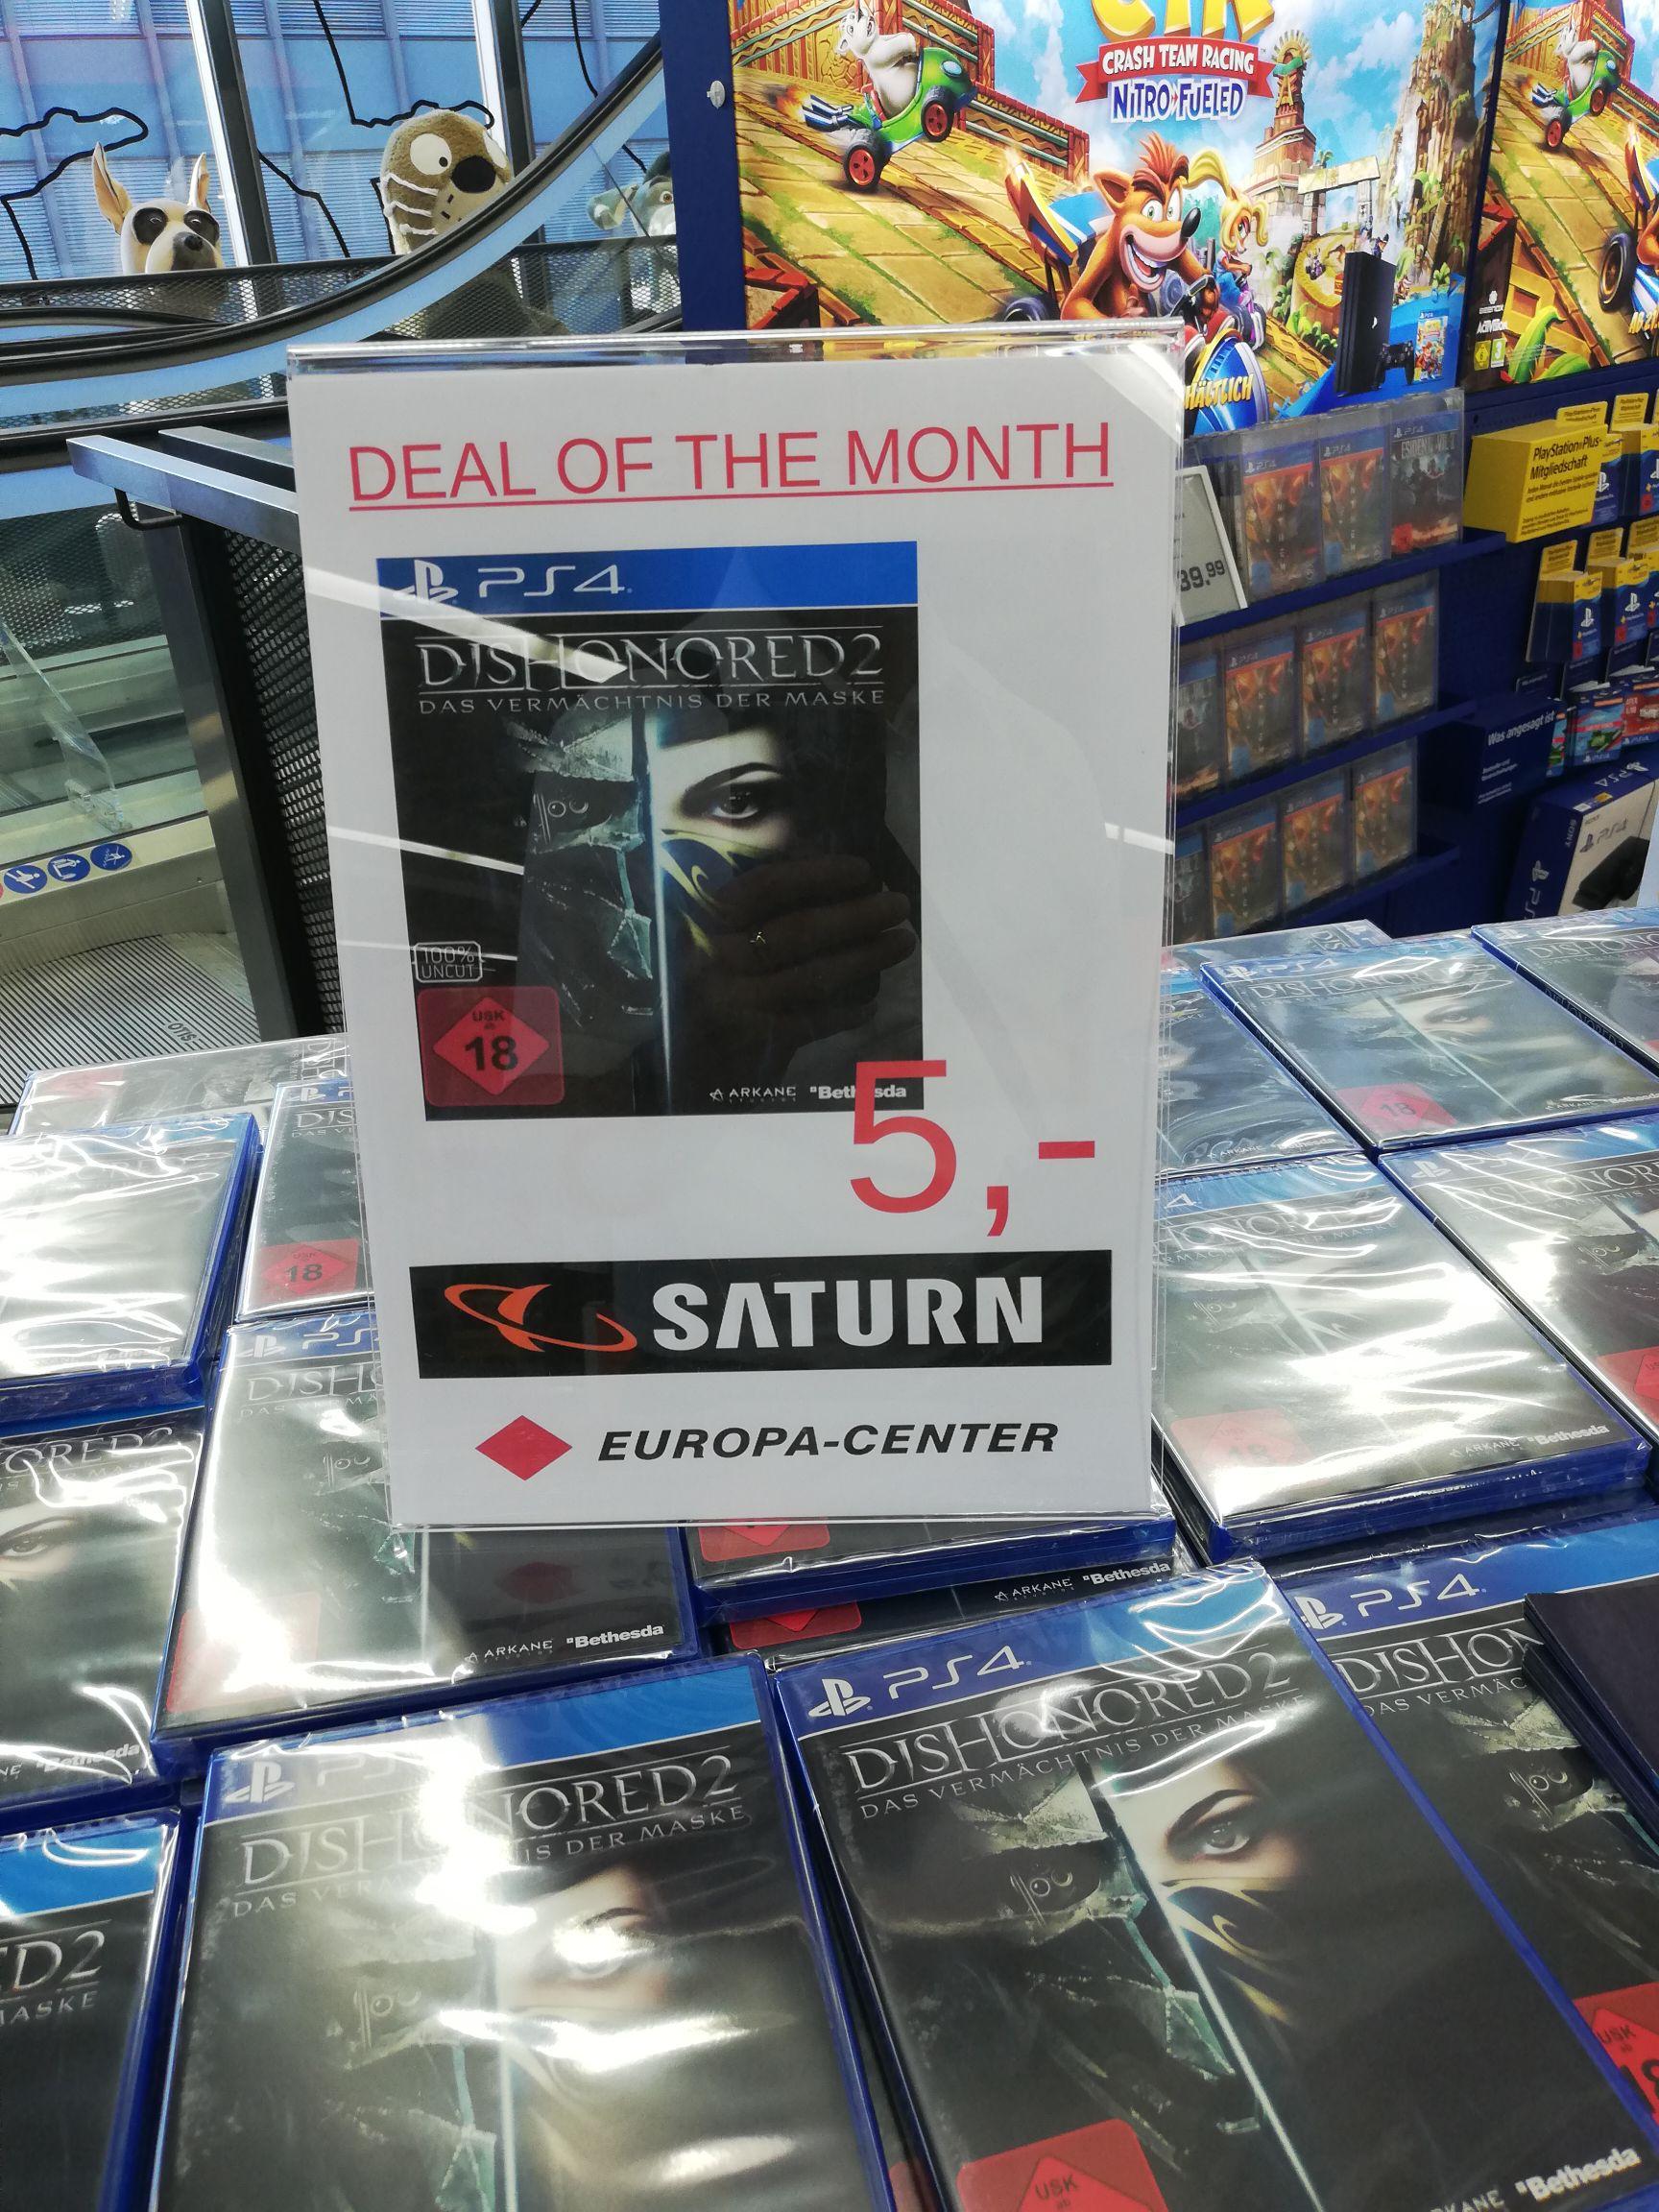 Lokal Saturn Berlin Europa Center PS4 Dishonored 2